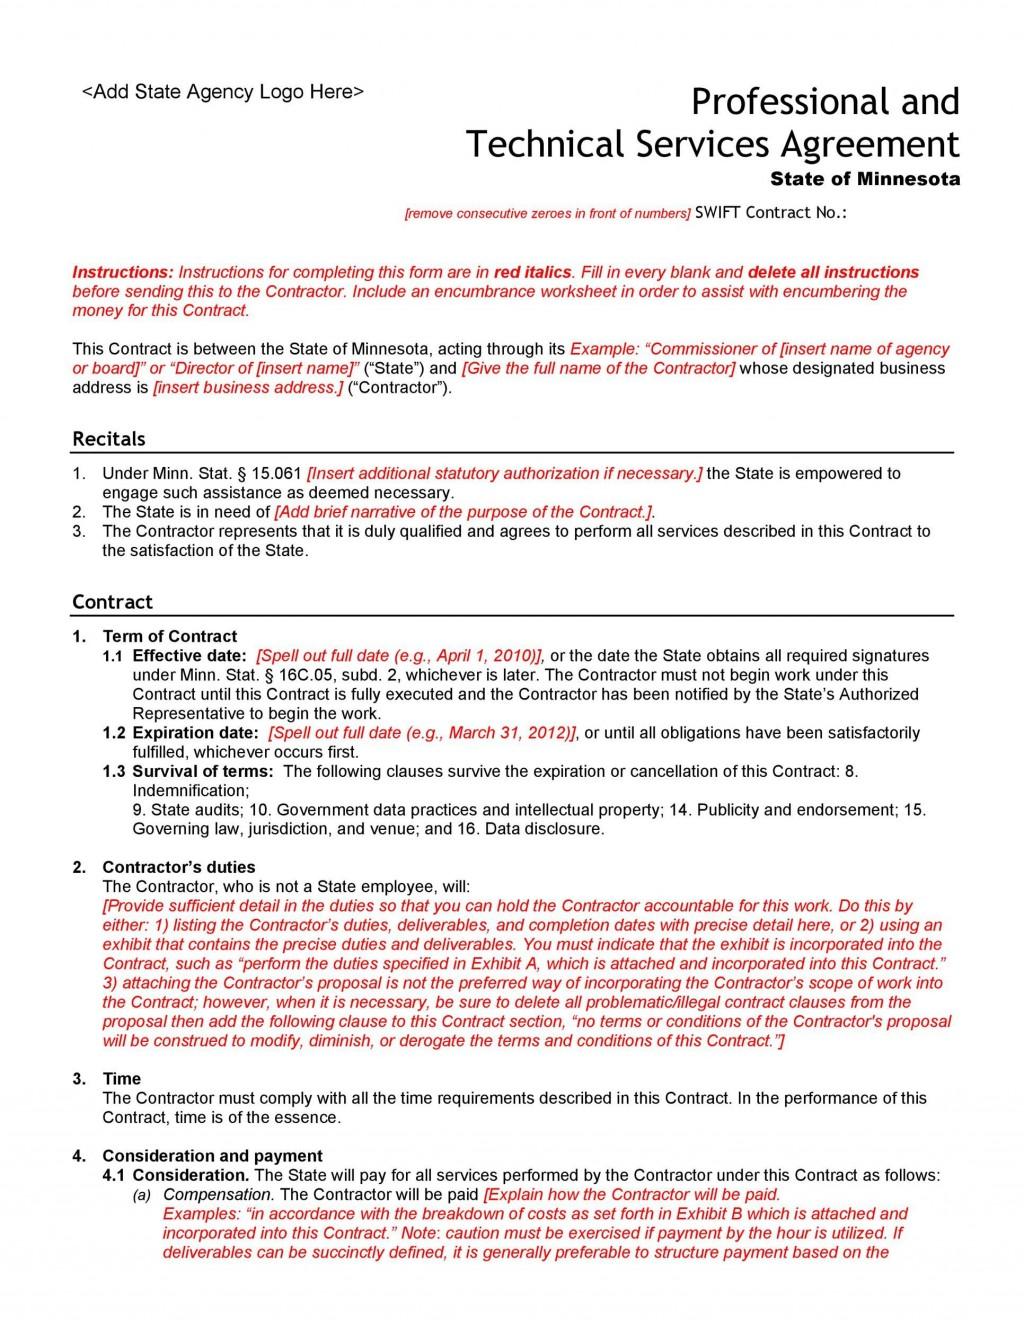 007 Stupendou Master Service Agreement Template Inspiration  Marketing For Software DevelopmentLarge